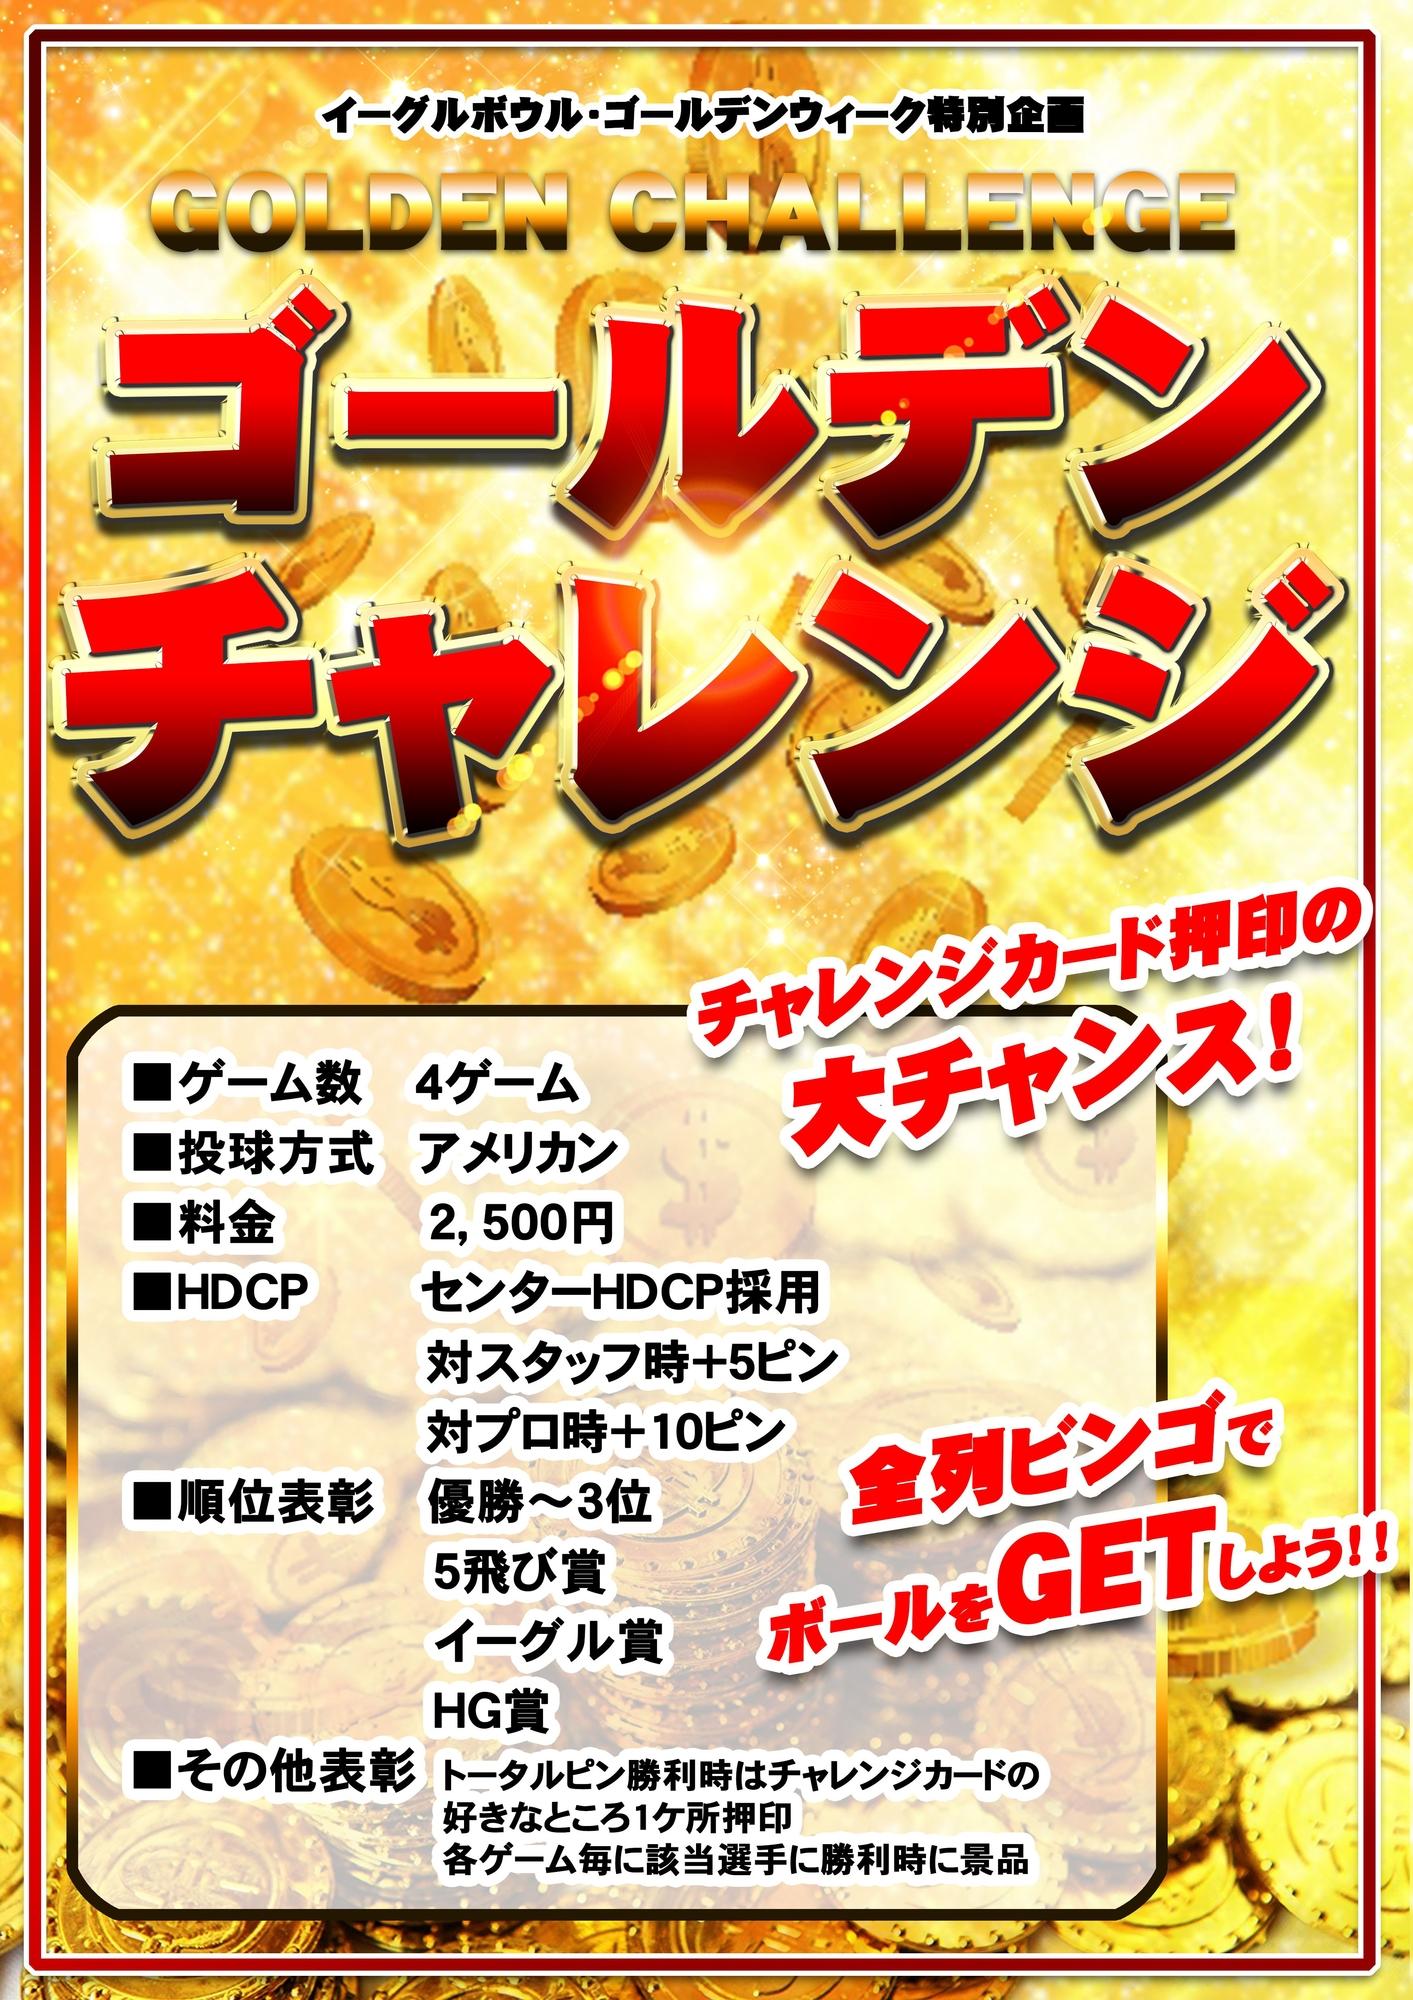 GW特別企画!ゴールデンチャレンジ!